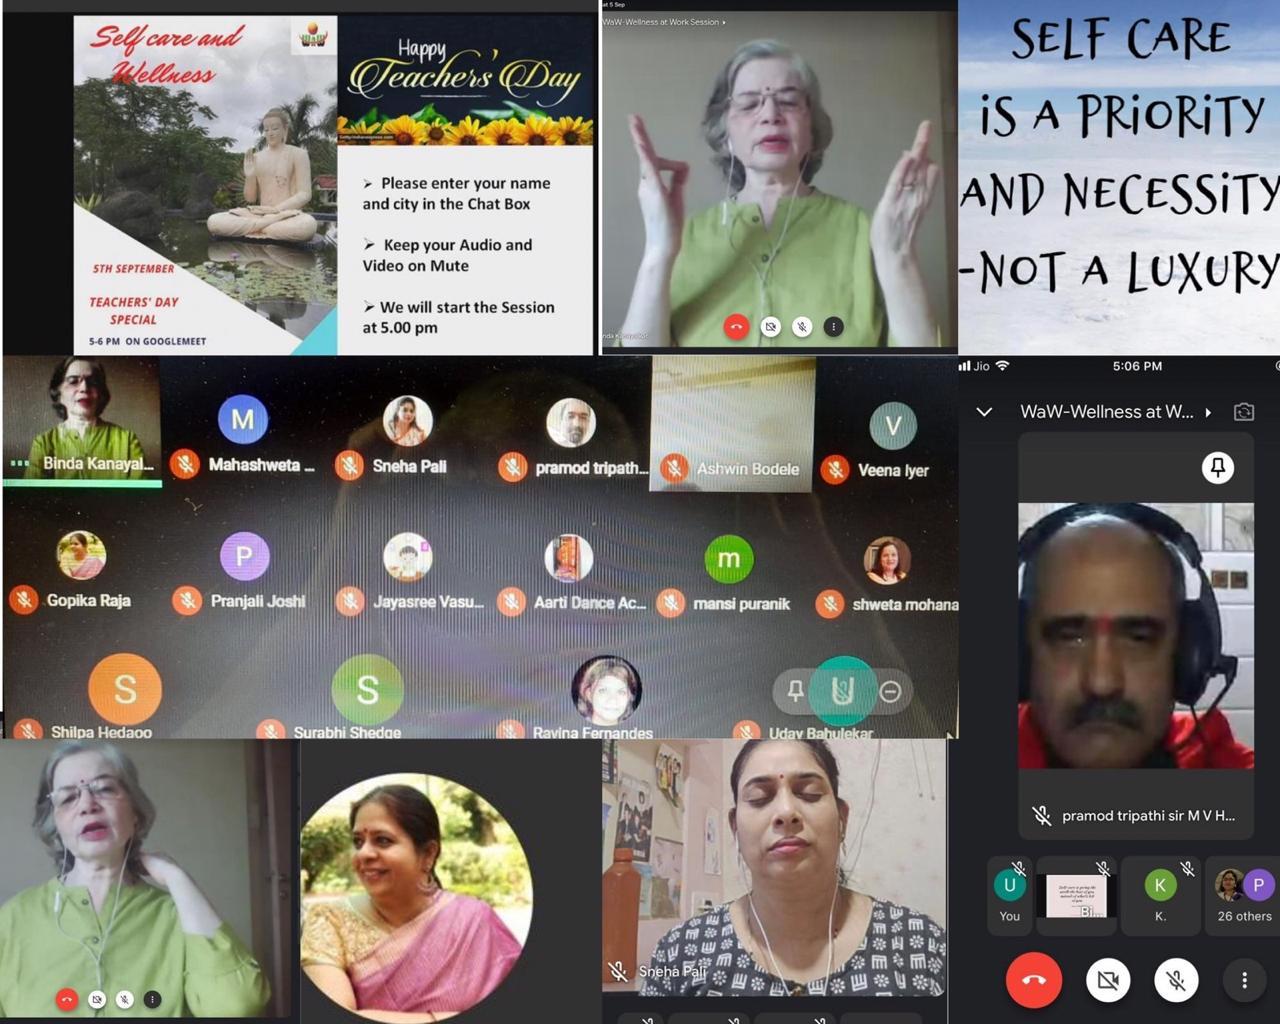 Binda teaching a Selfcare and Wellness virtual class.